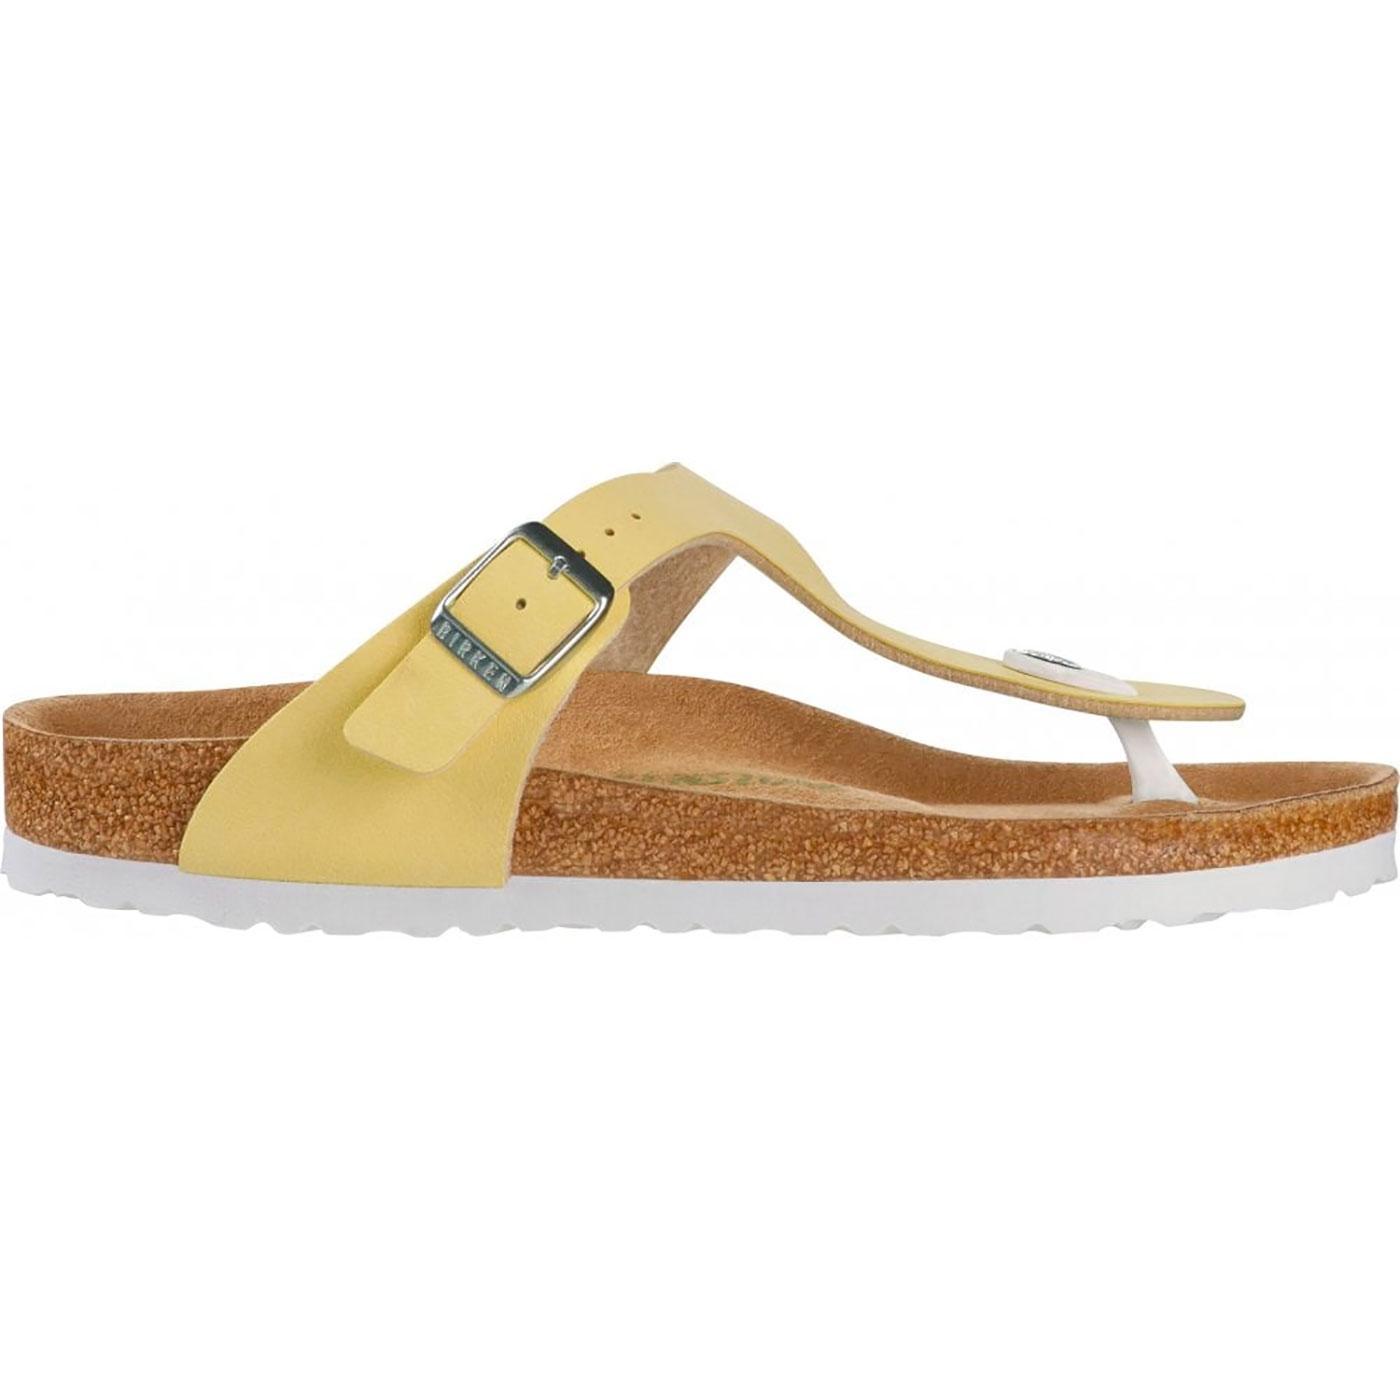 Gizeh BF BIRKENSTOCK Women's Sandals in